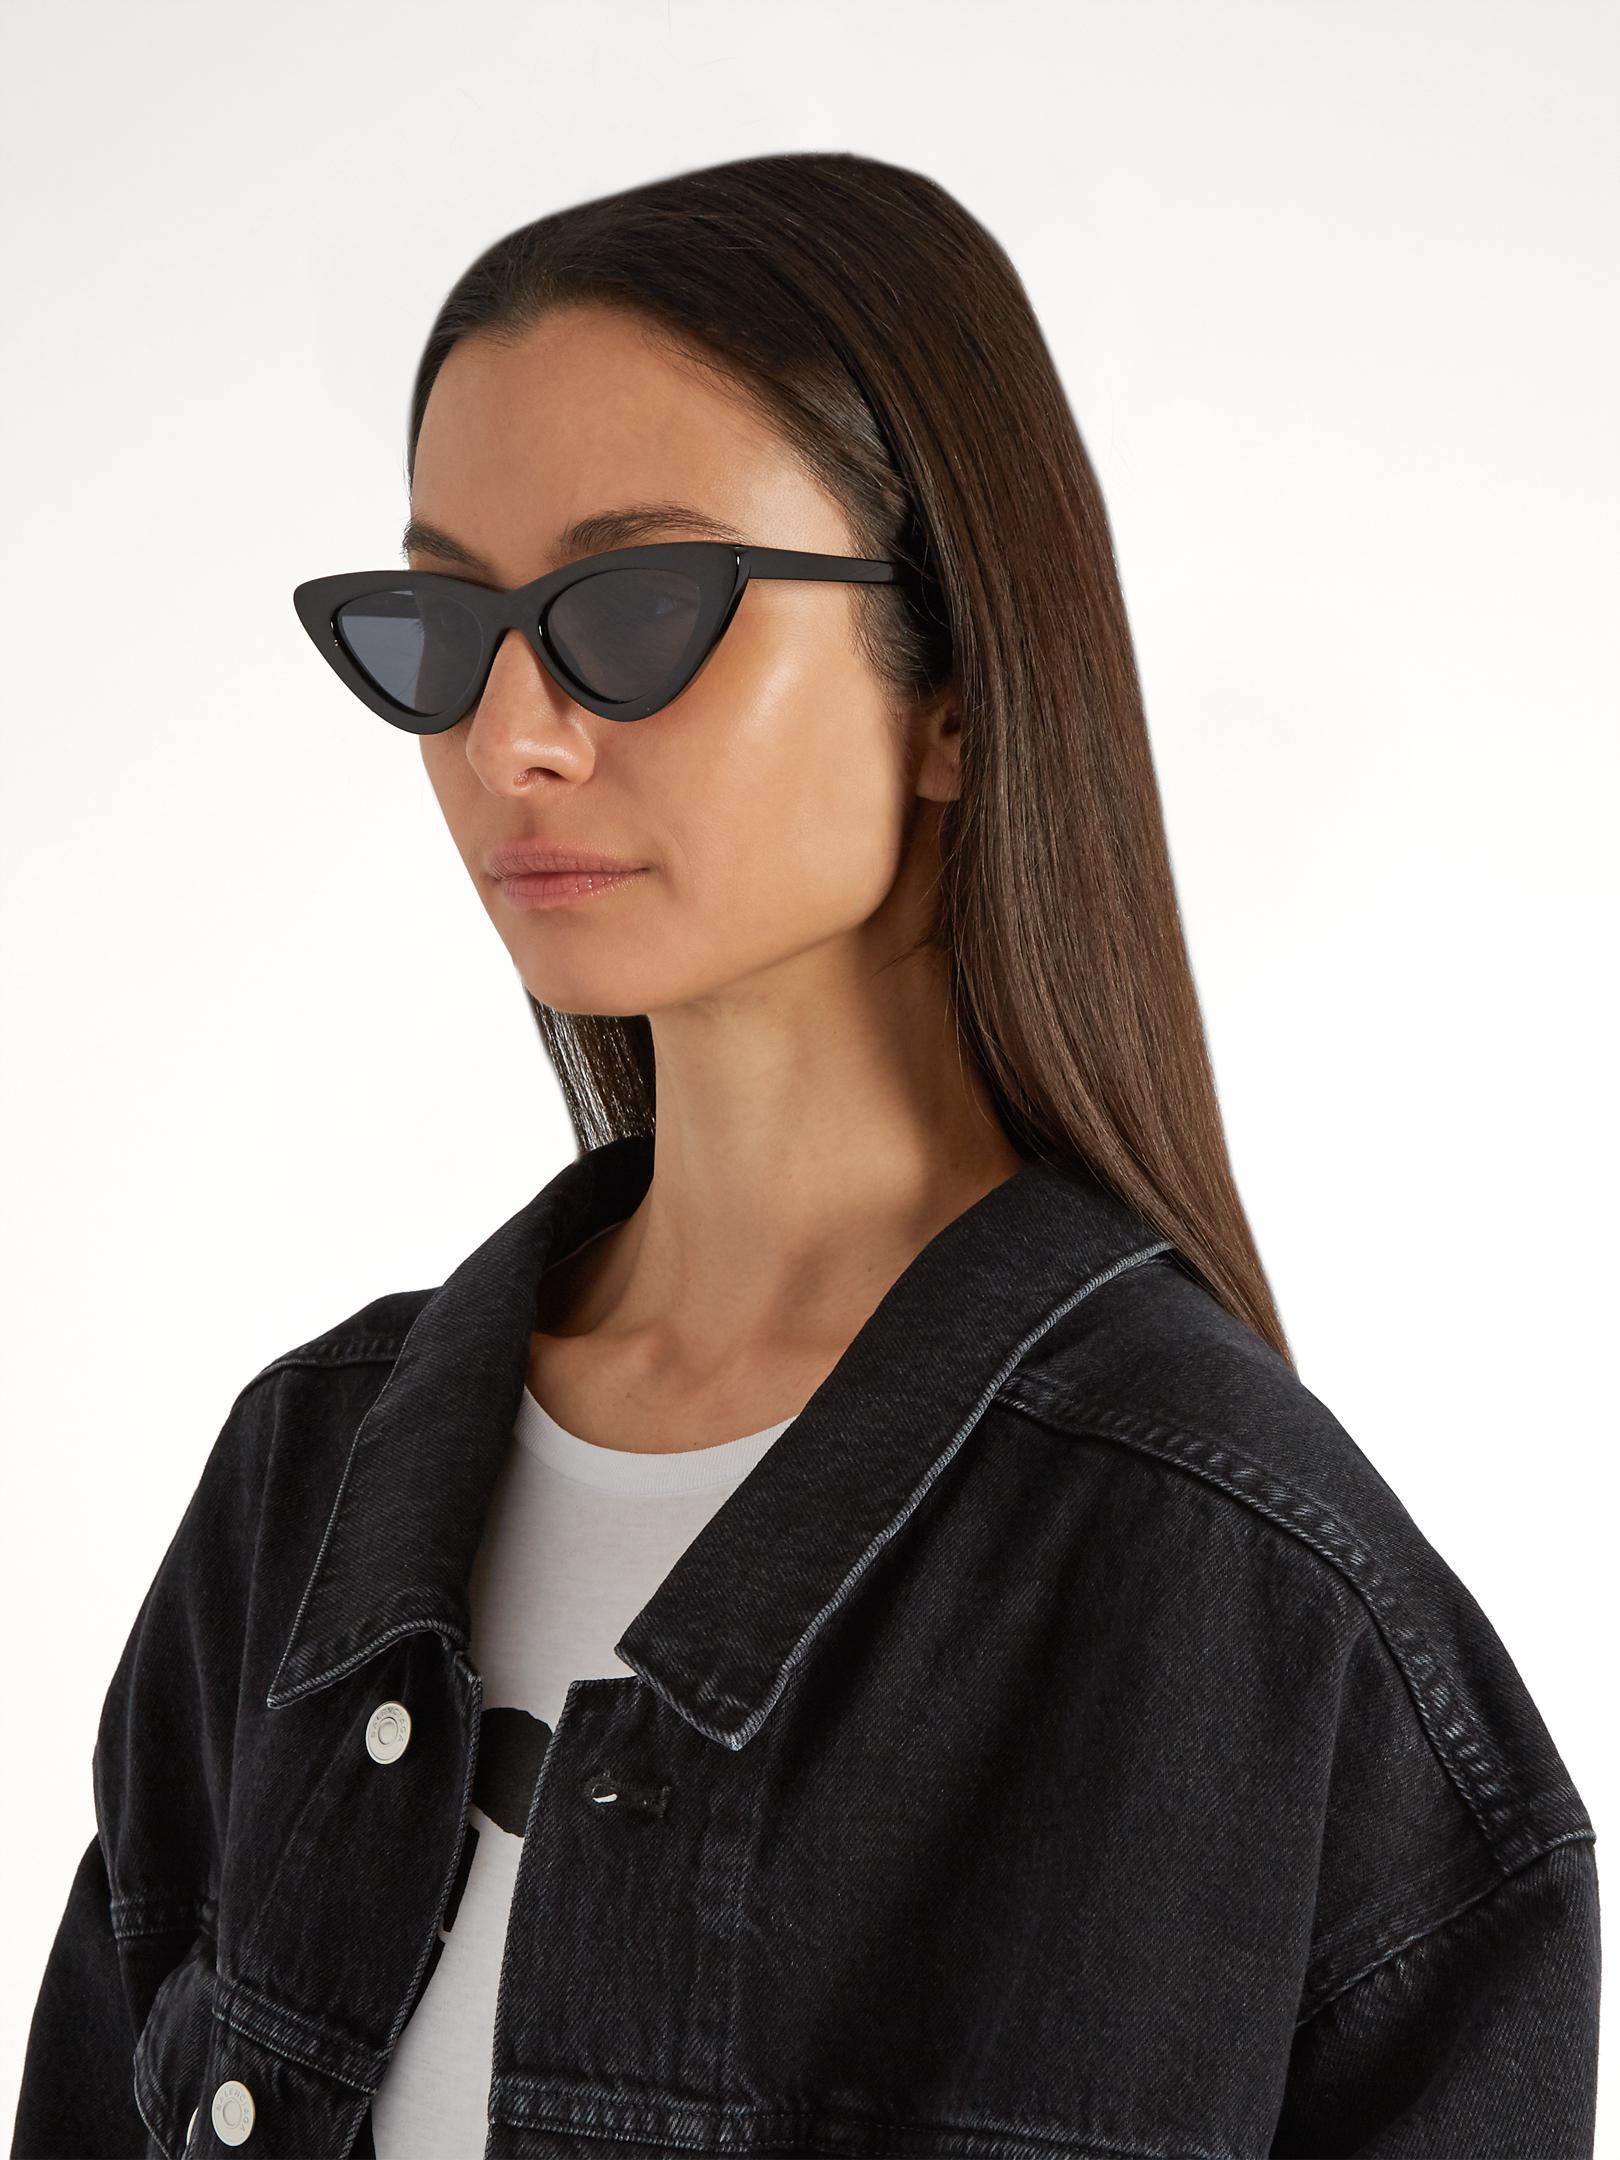 357a3871c17 Lyst - Le Specs The Last Lolita Cat-eye Sunglasses in Black